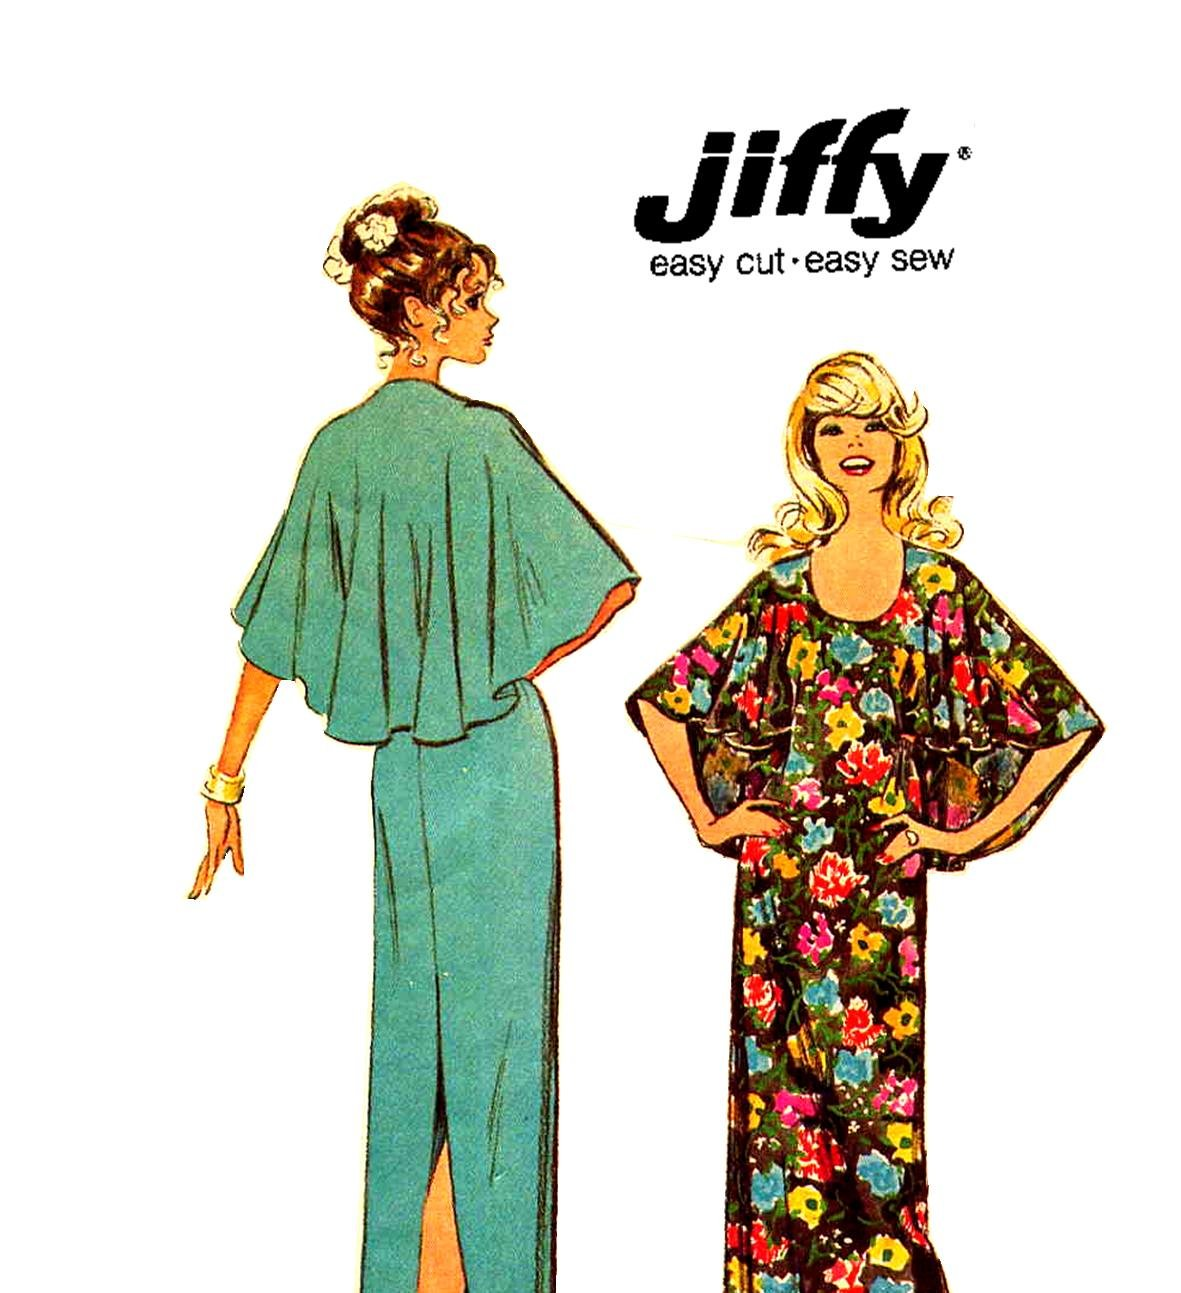 Sassy 70s Jiffy Backless Cape Shoulder Dress Simplicity 5420 Vintage Pattern Bust 38